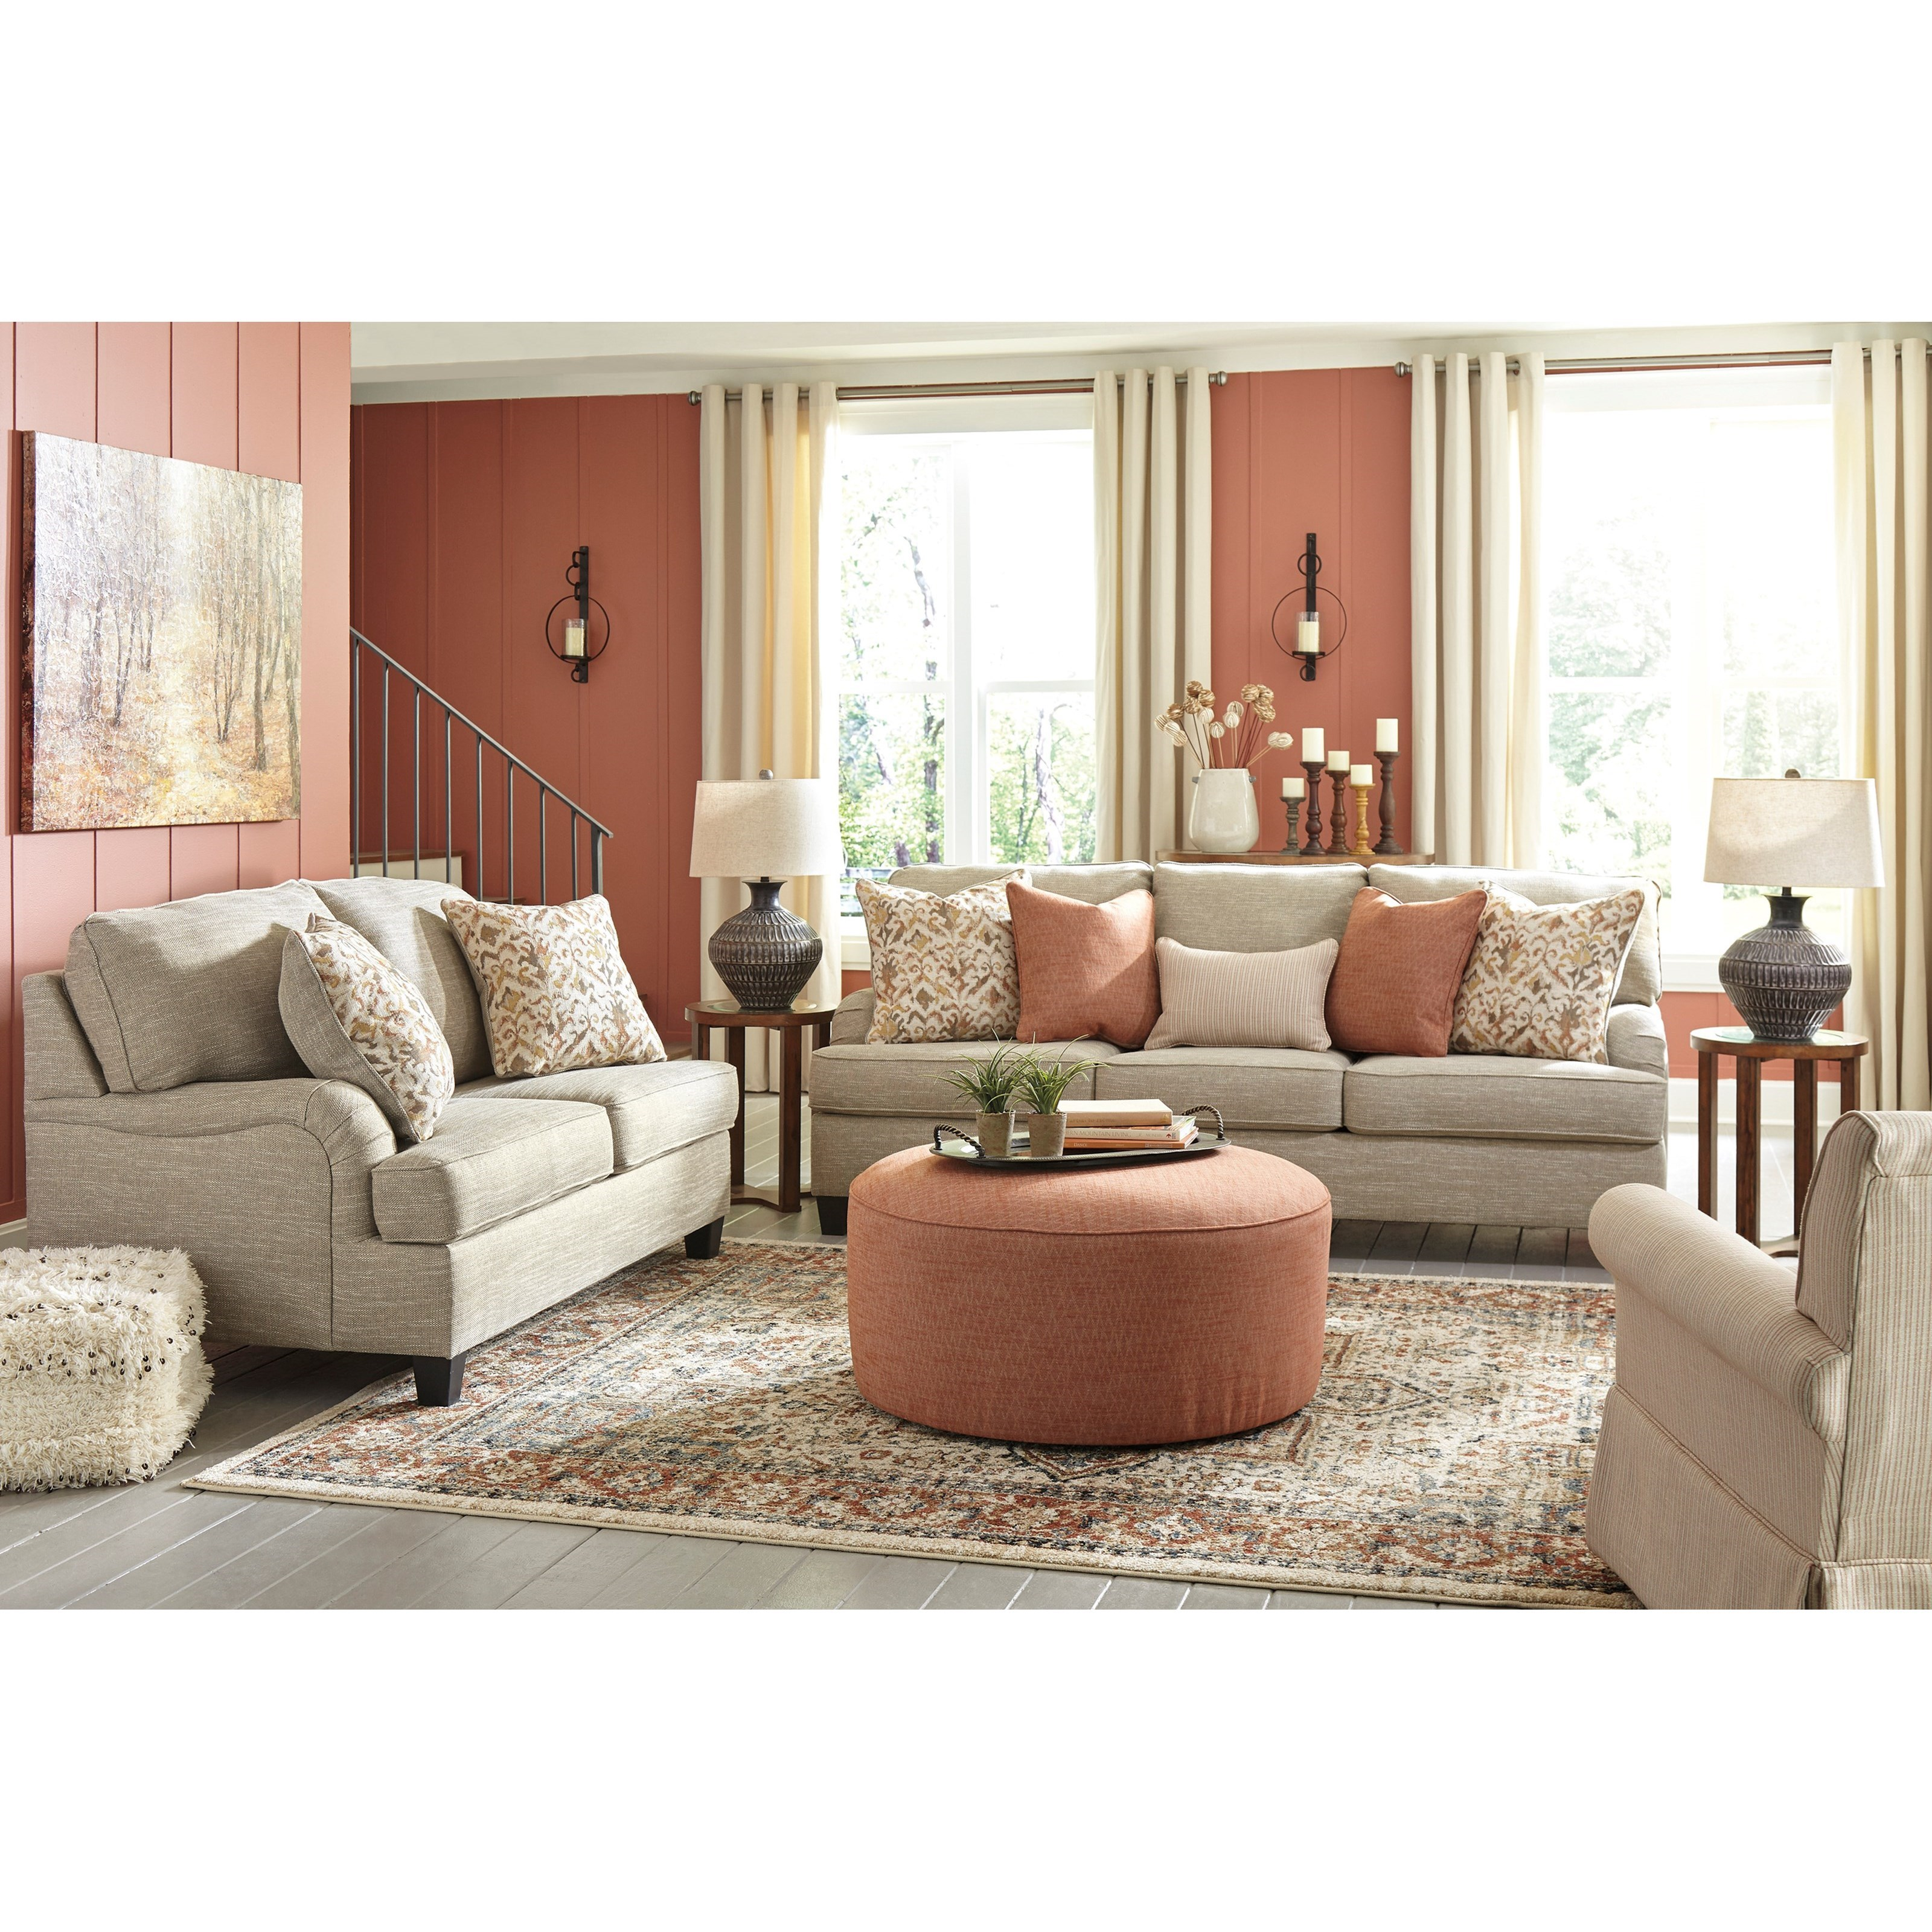 Signature Design by Ashley Almanza Queen Sofa Sleeper with ...